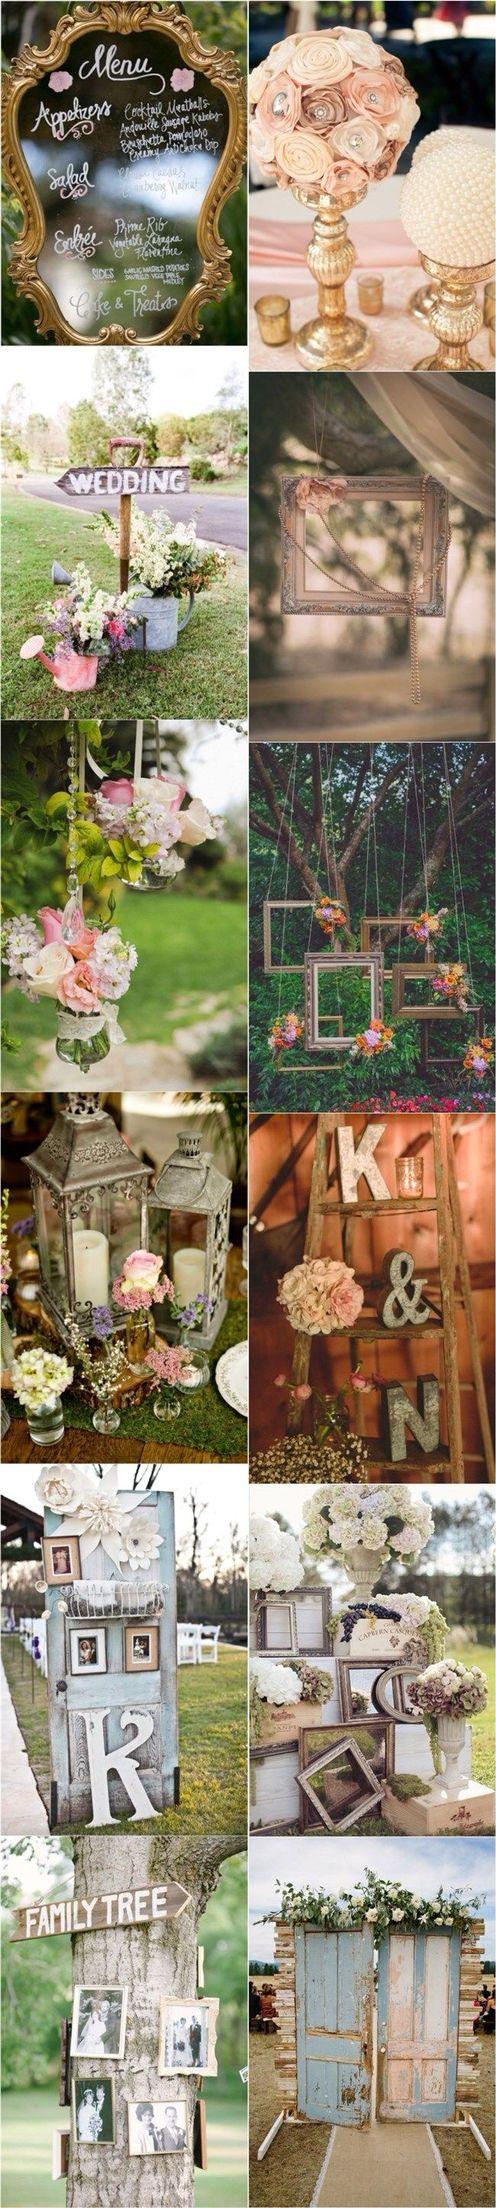 Wedding decoration ideas home  General  svatba  Pinterest  Wedding Weddings and Wedding stuff